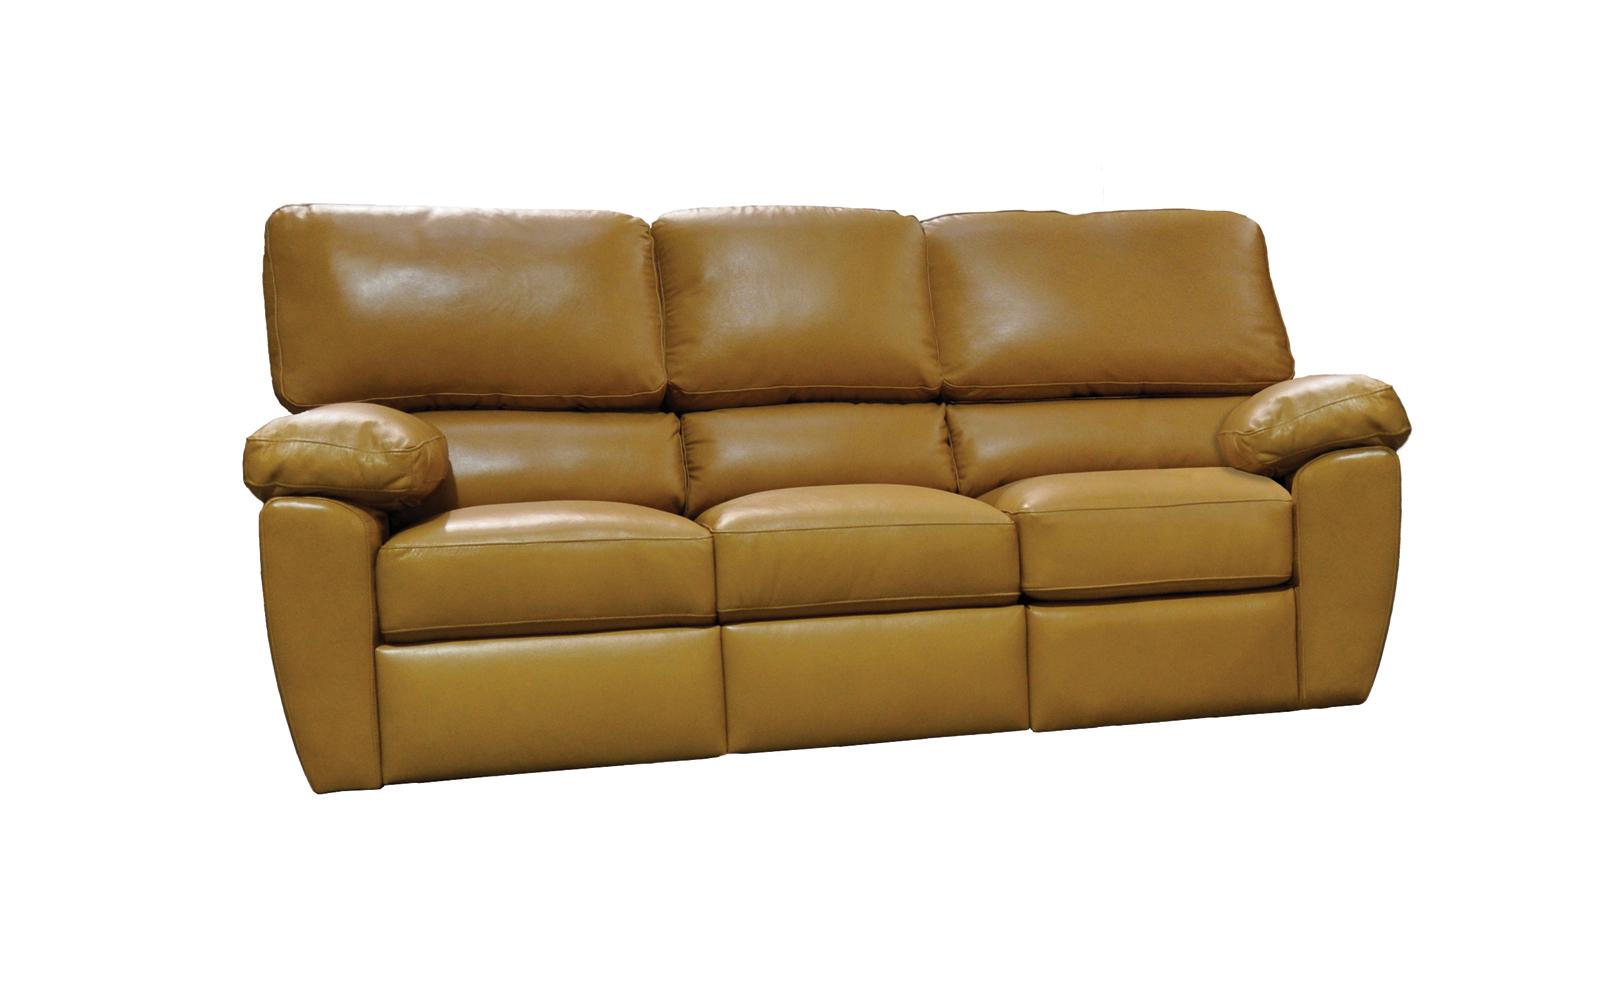 Omnia Furniture Vercelli Reclining Leather Sofa